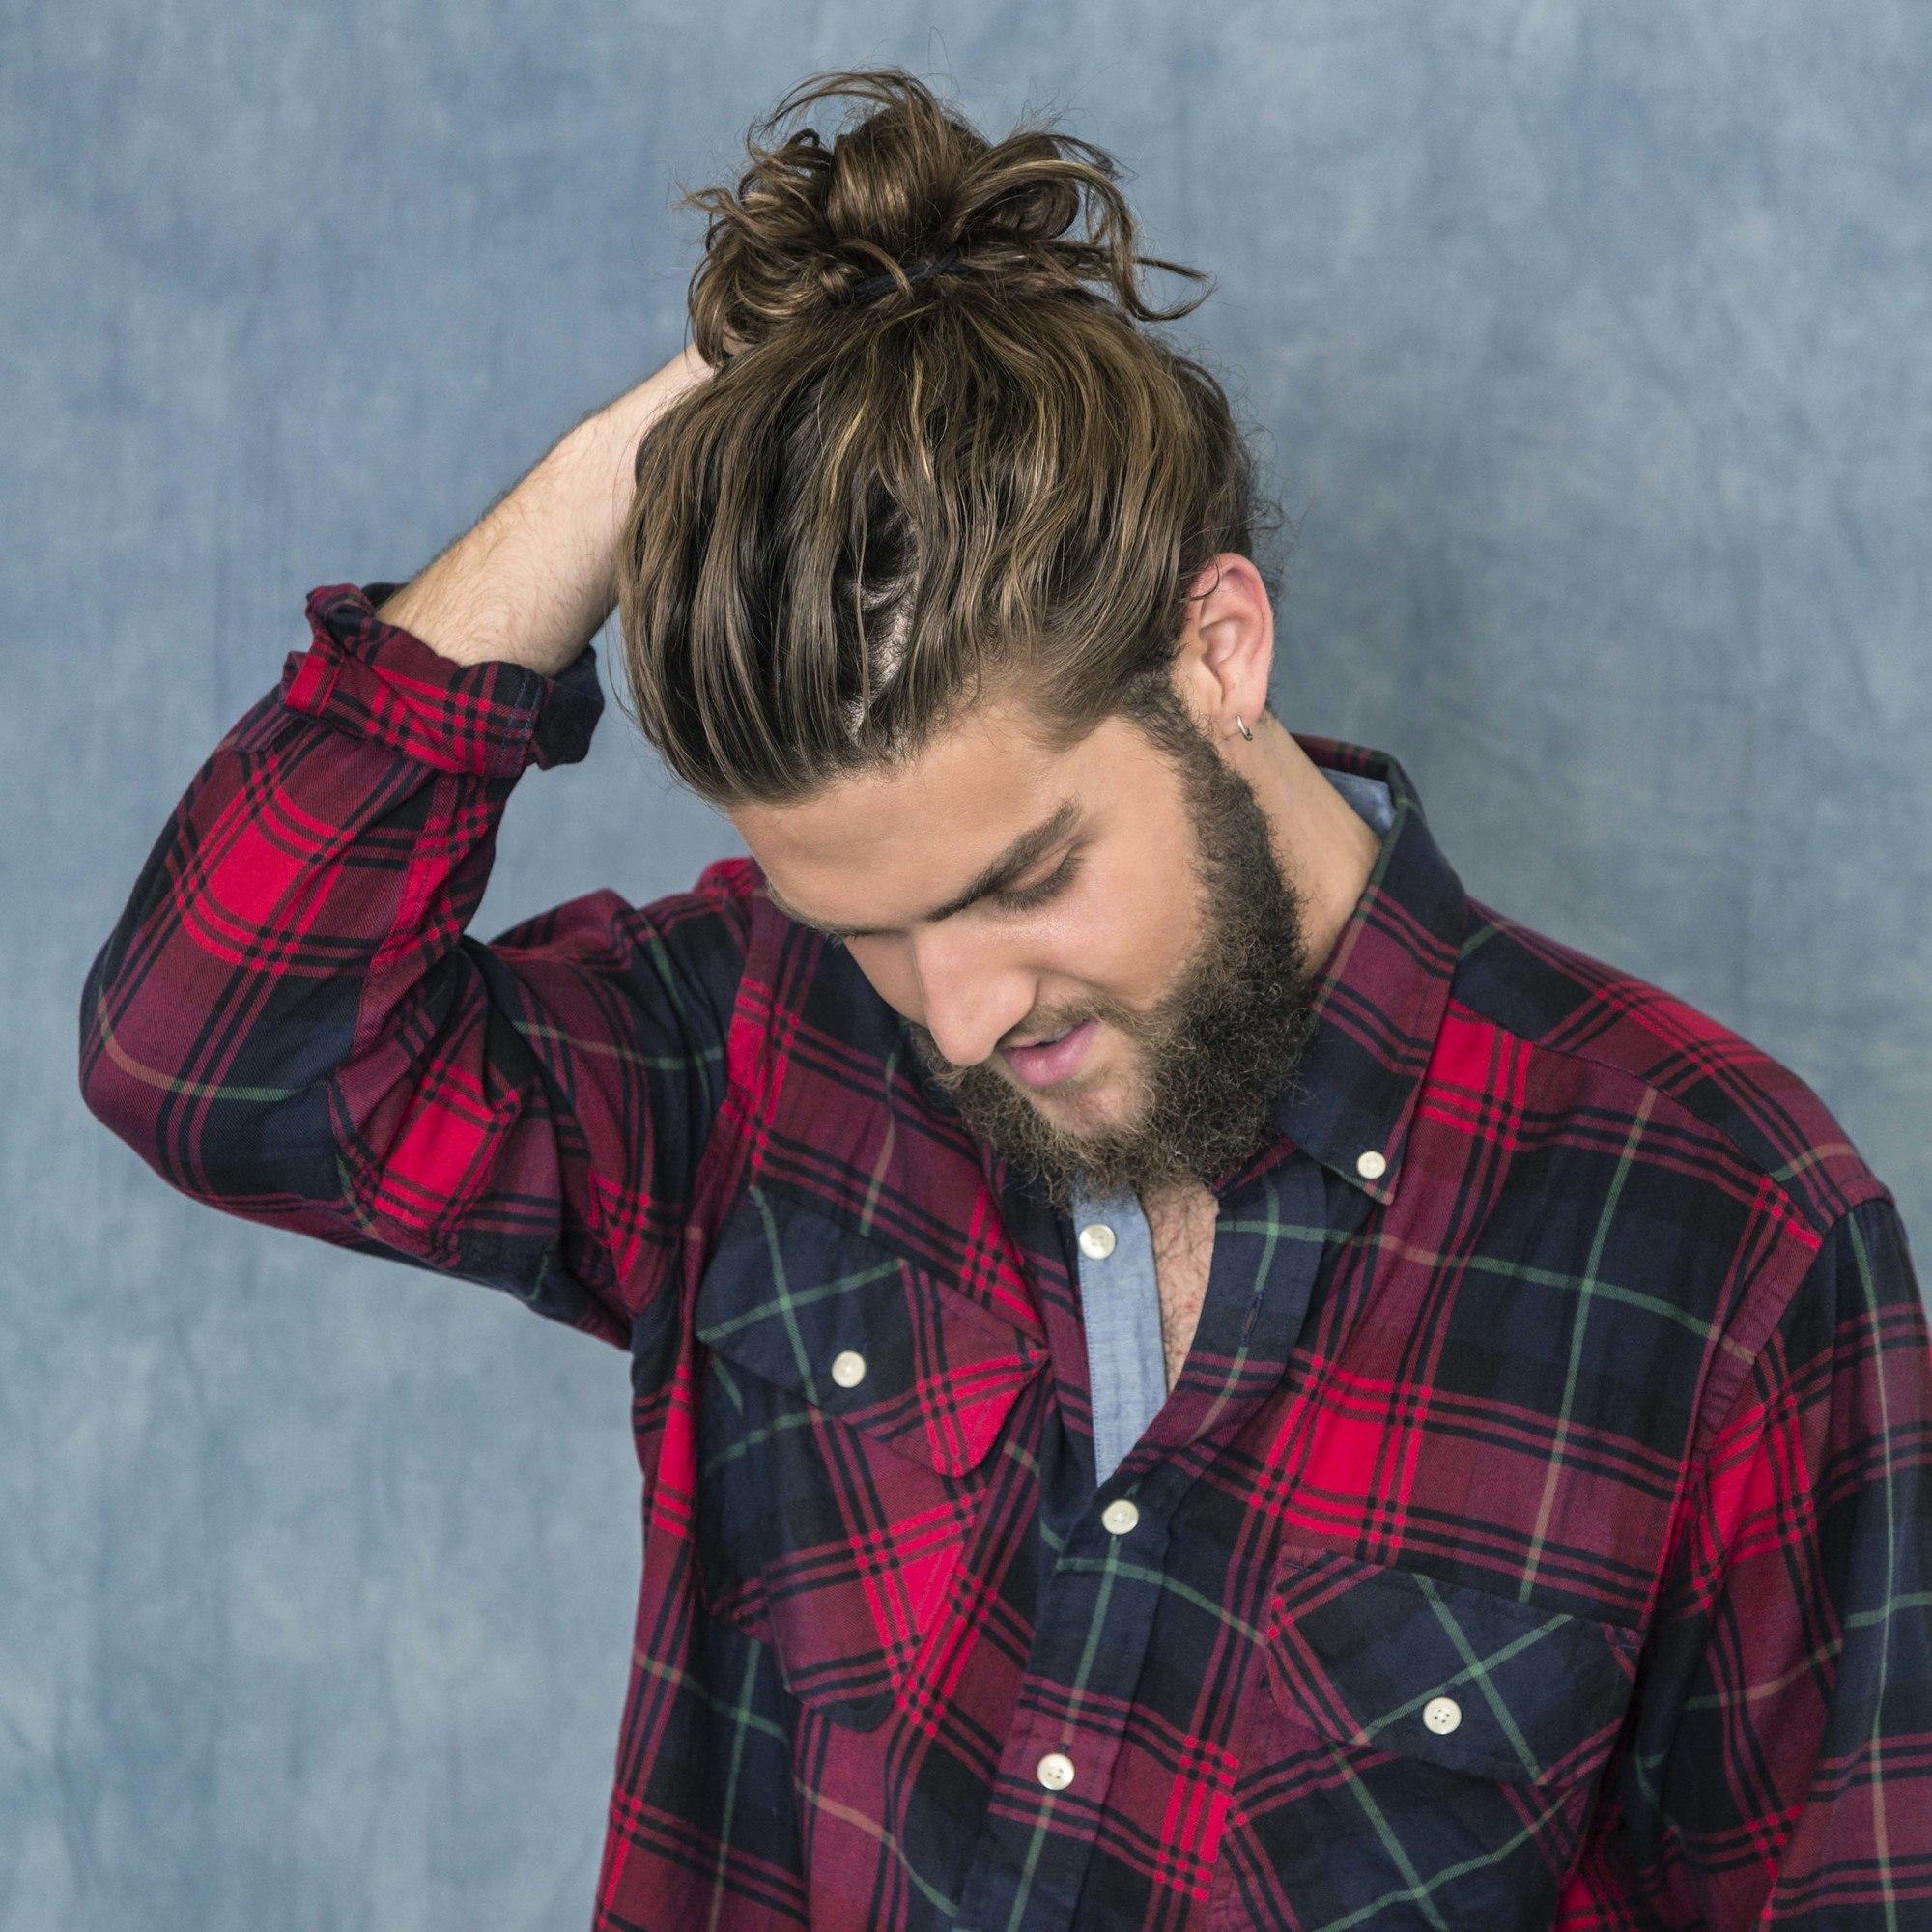 Man Top Knot Hairstyles 6 Cool Updos That Aren T The Man Bun